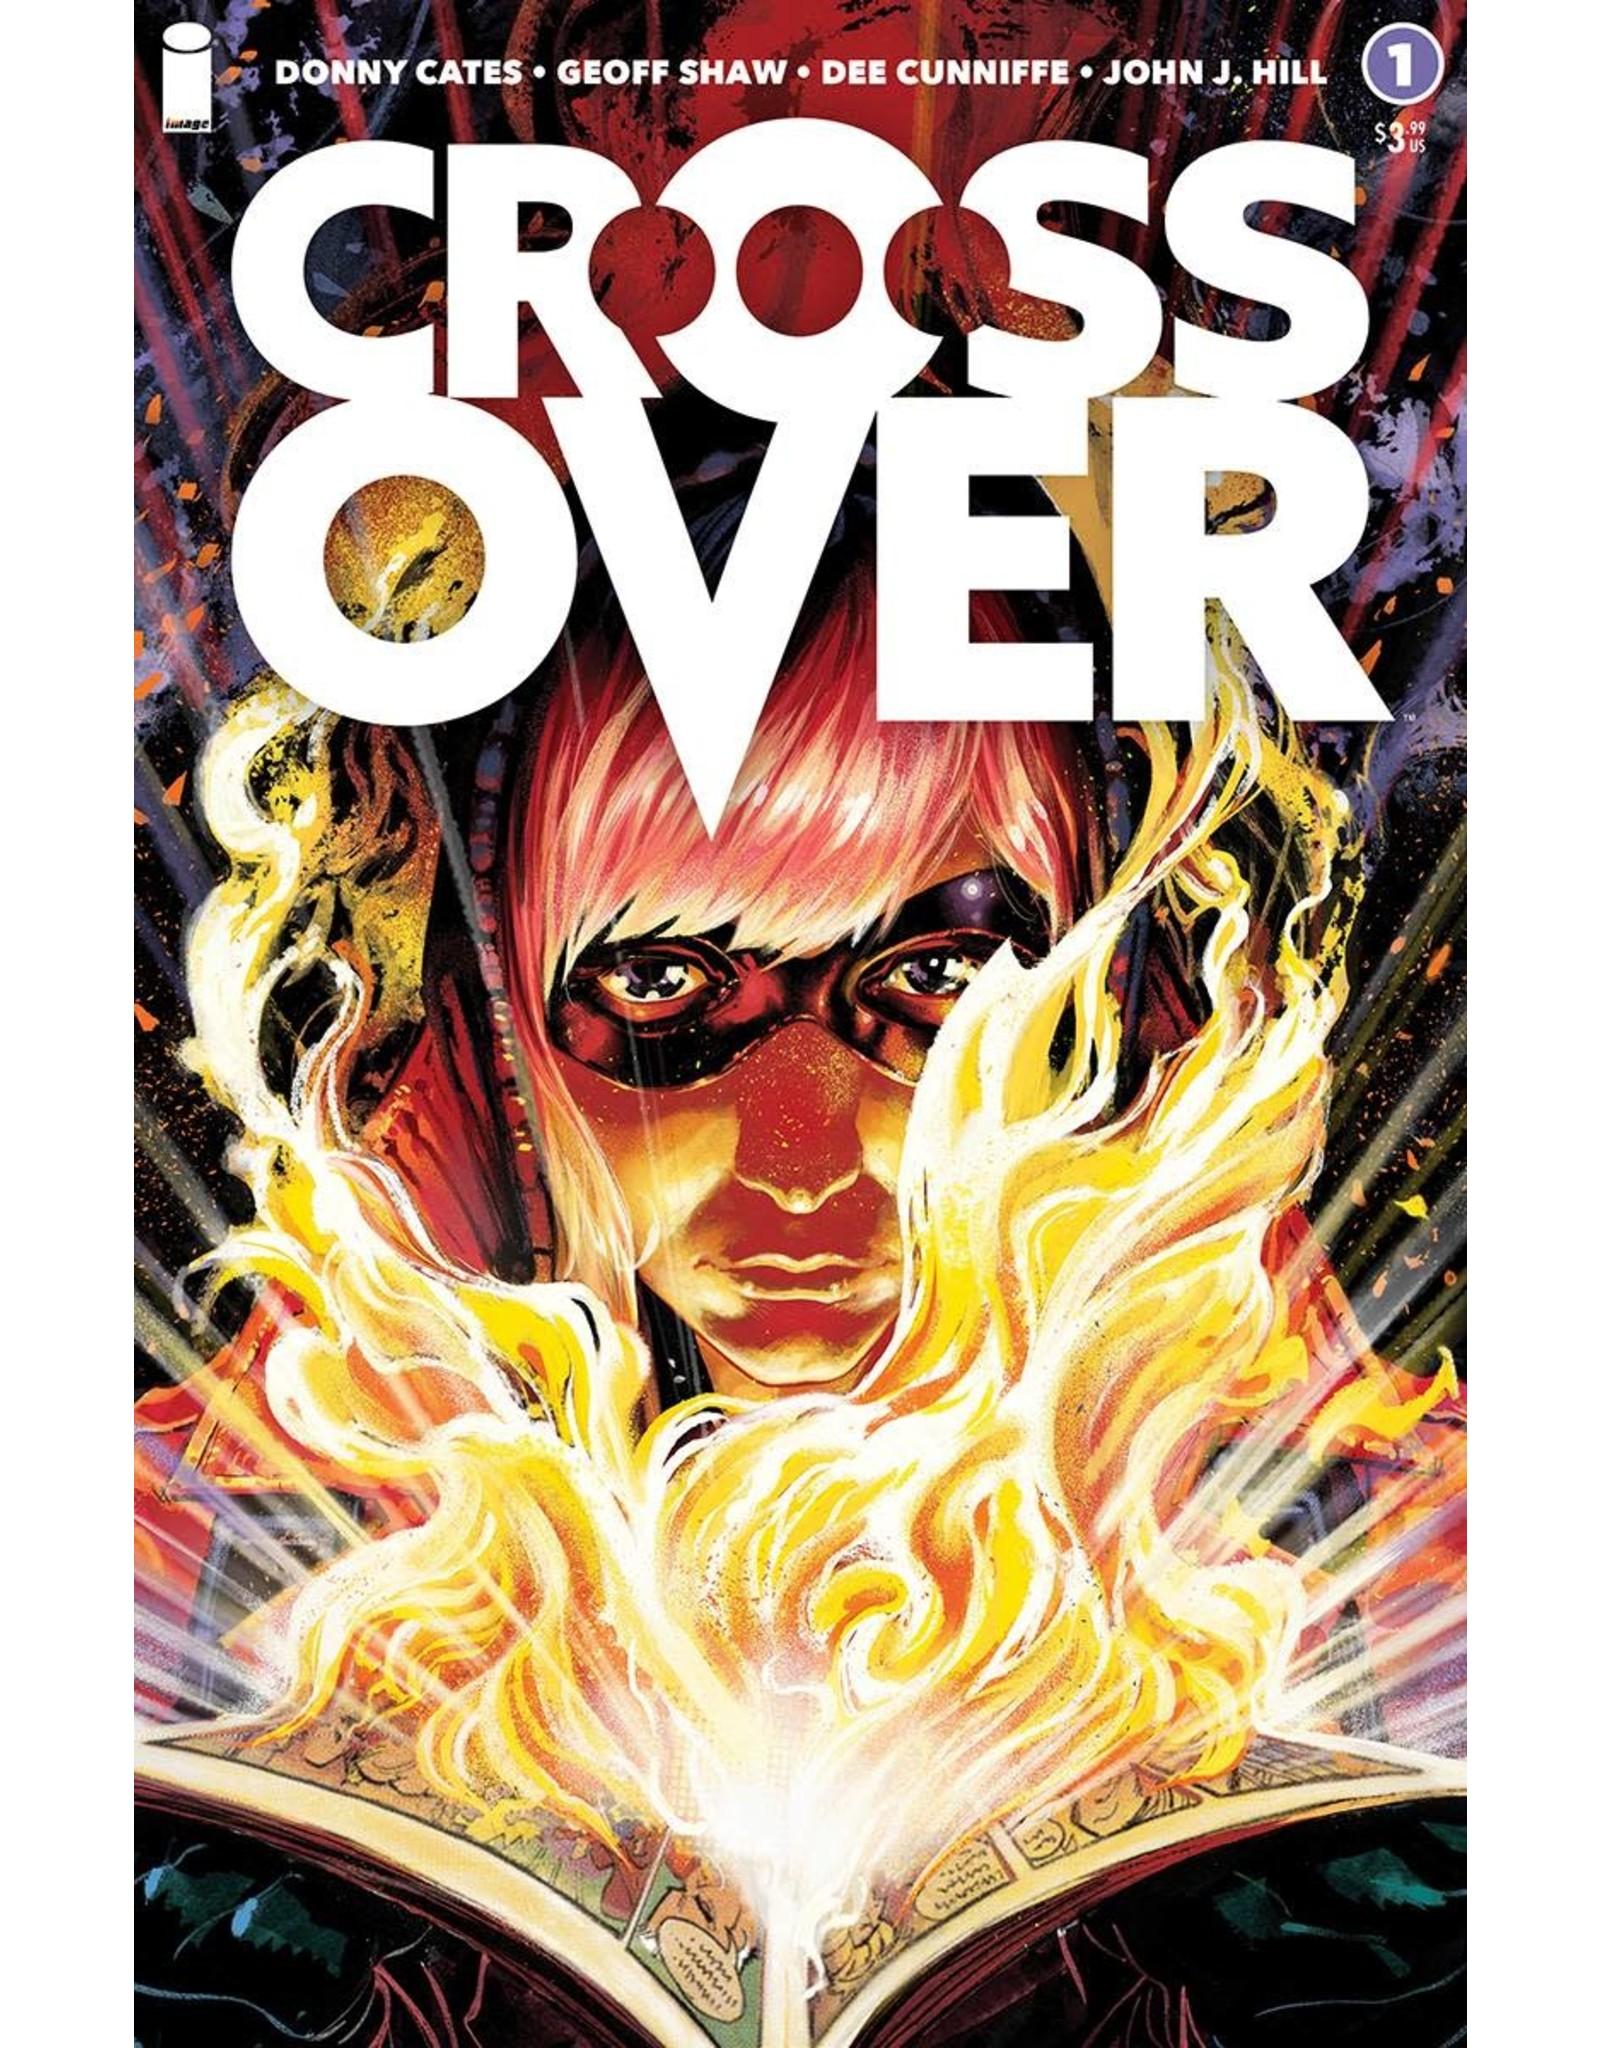 Image Comics CROSSOVER #1 CVR C SHAW